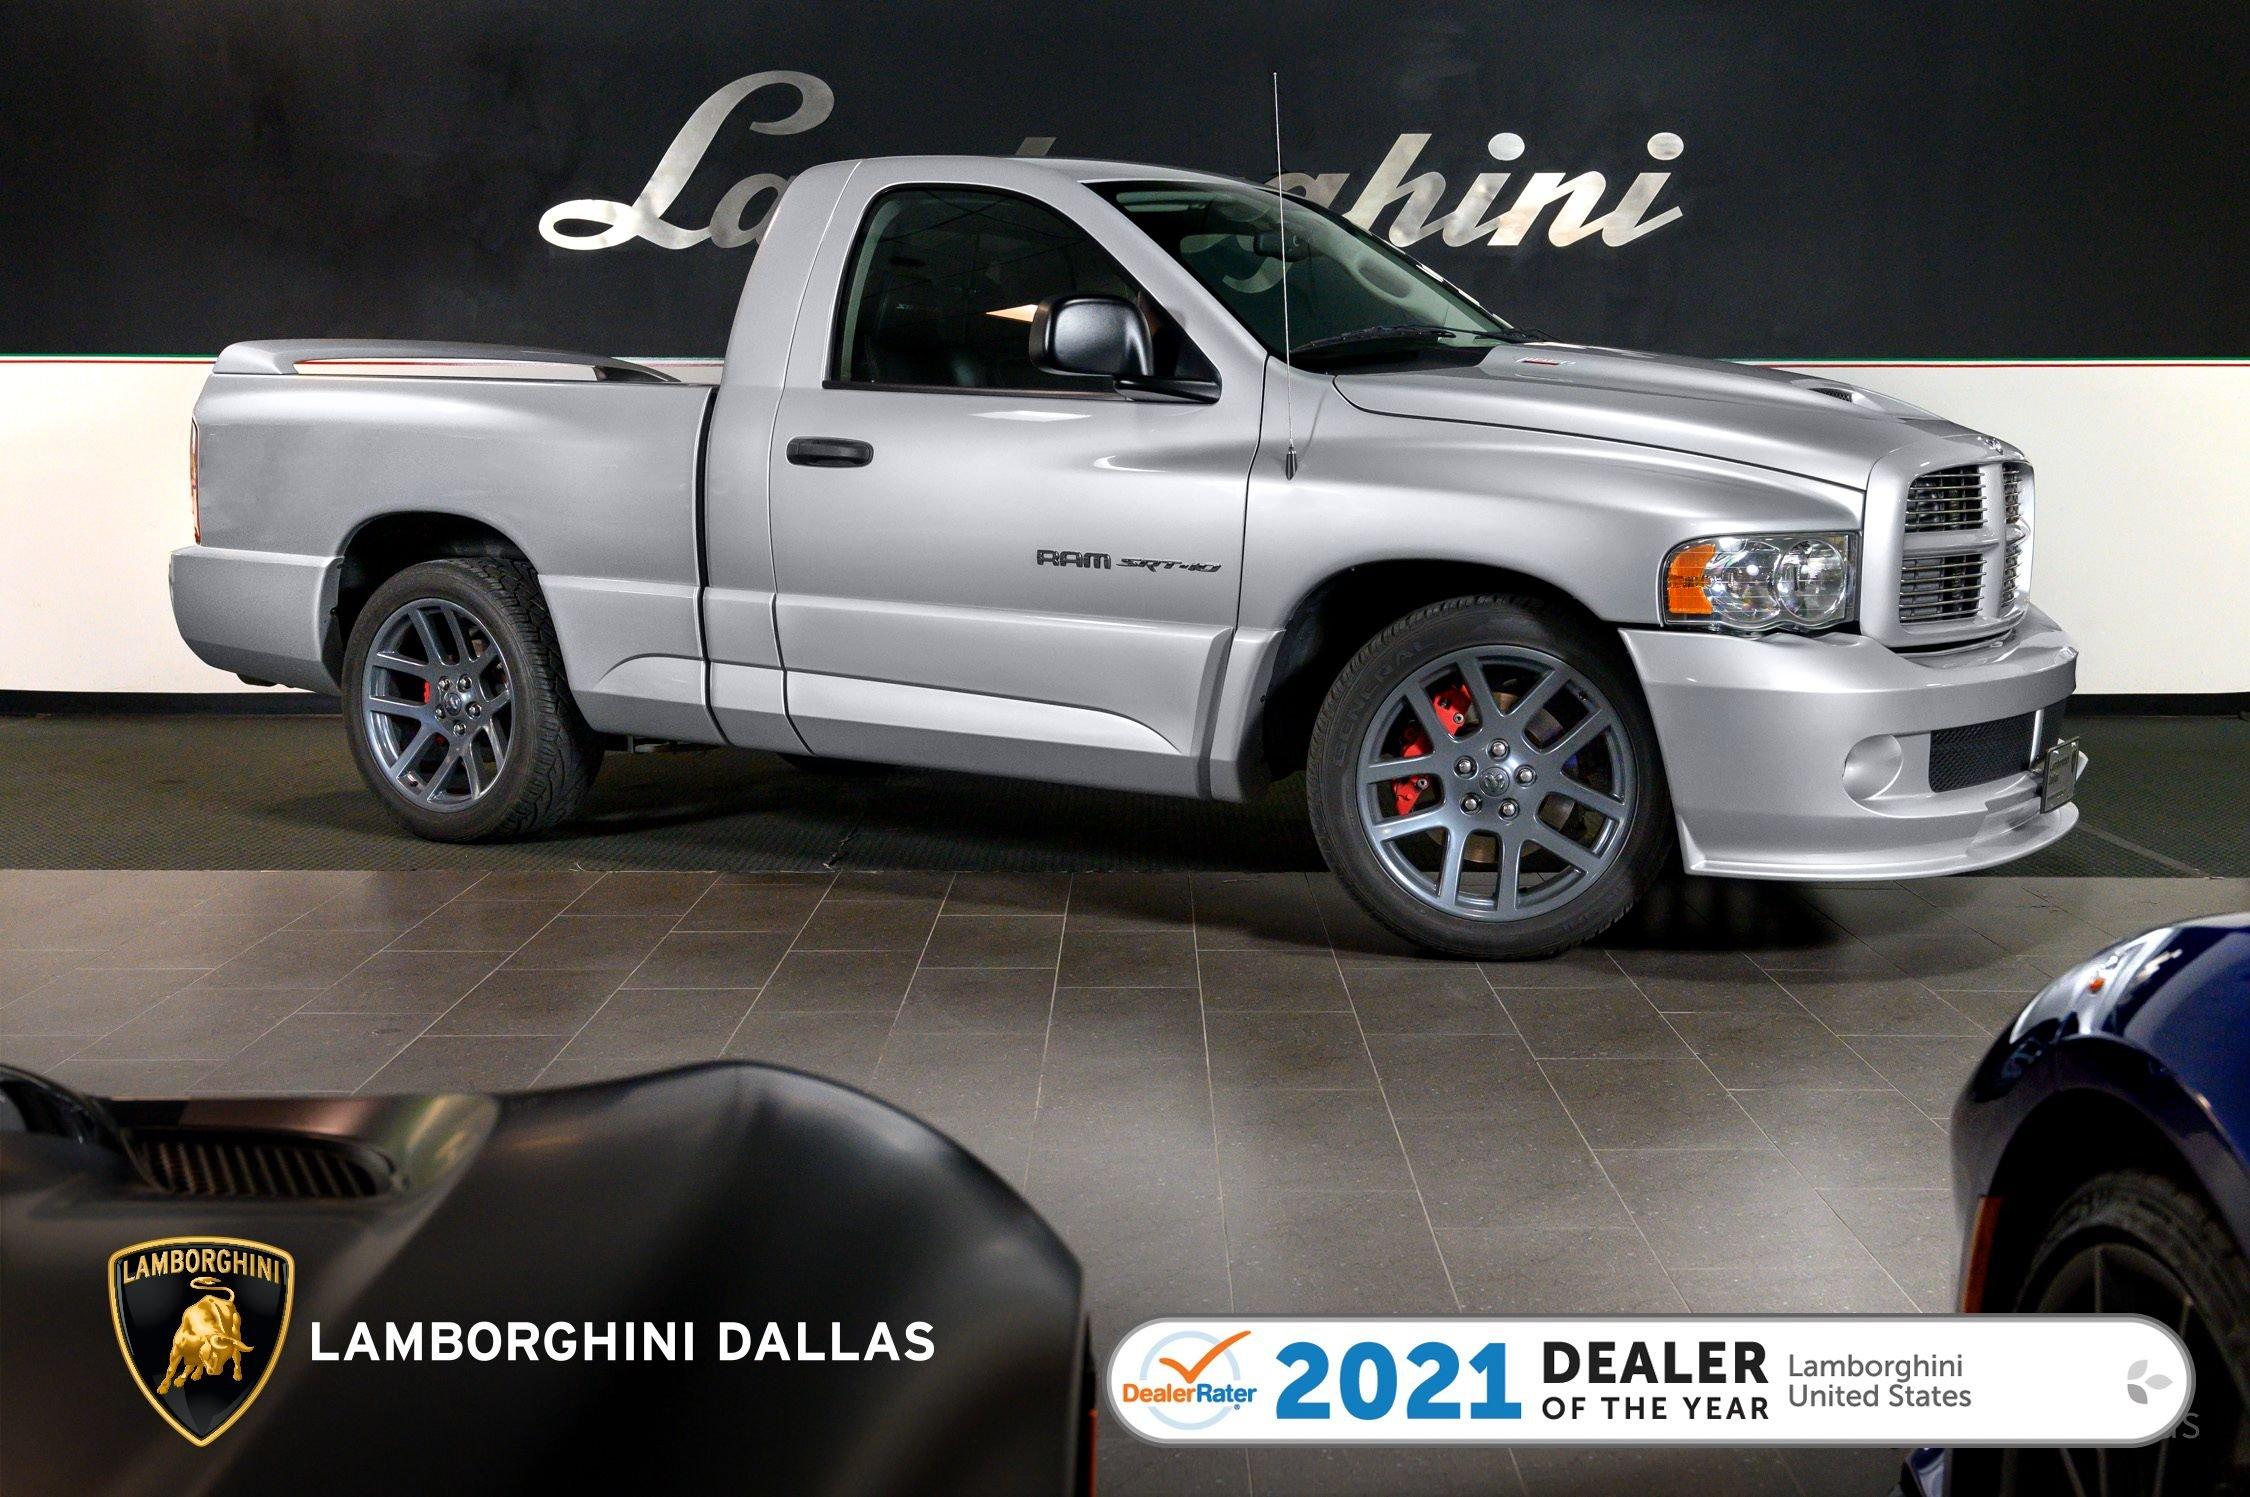 used 2005 Dodge RAM SRT-10 car, priced at $49,999